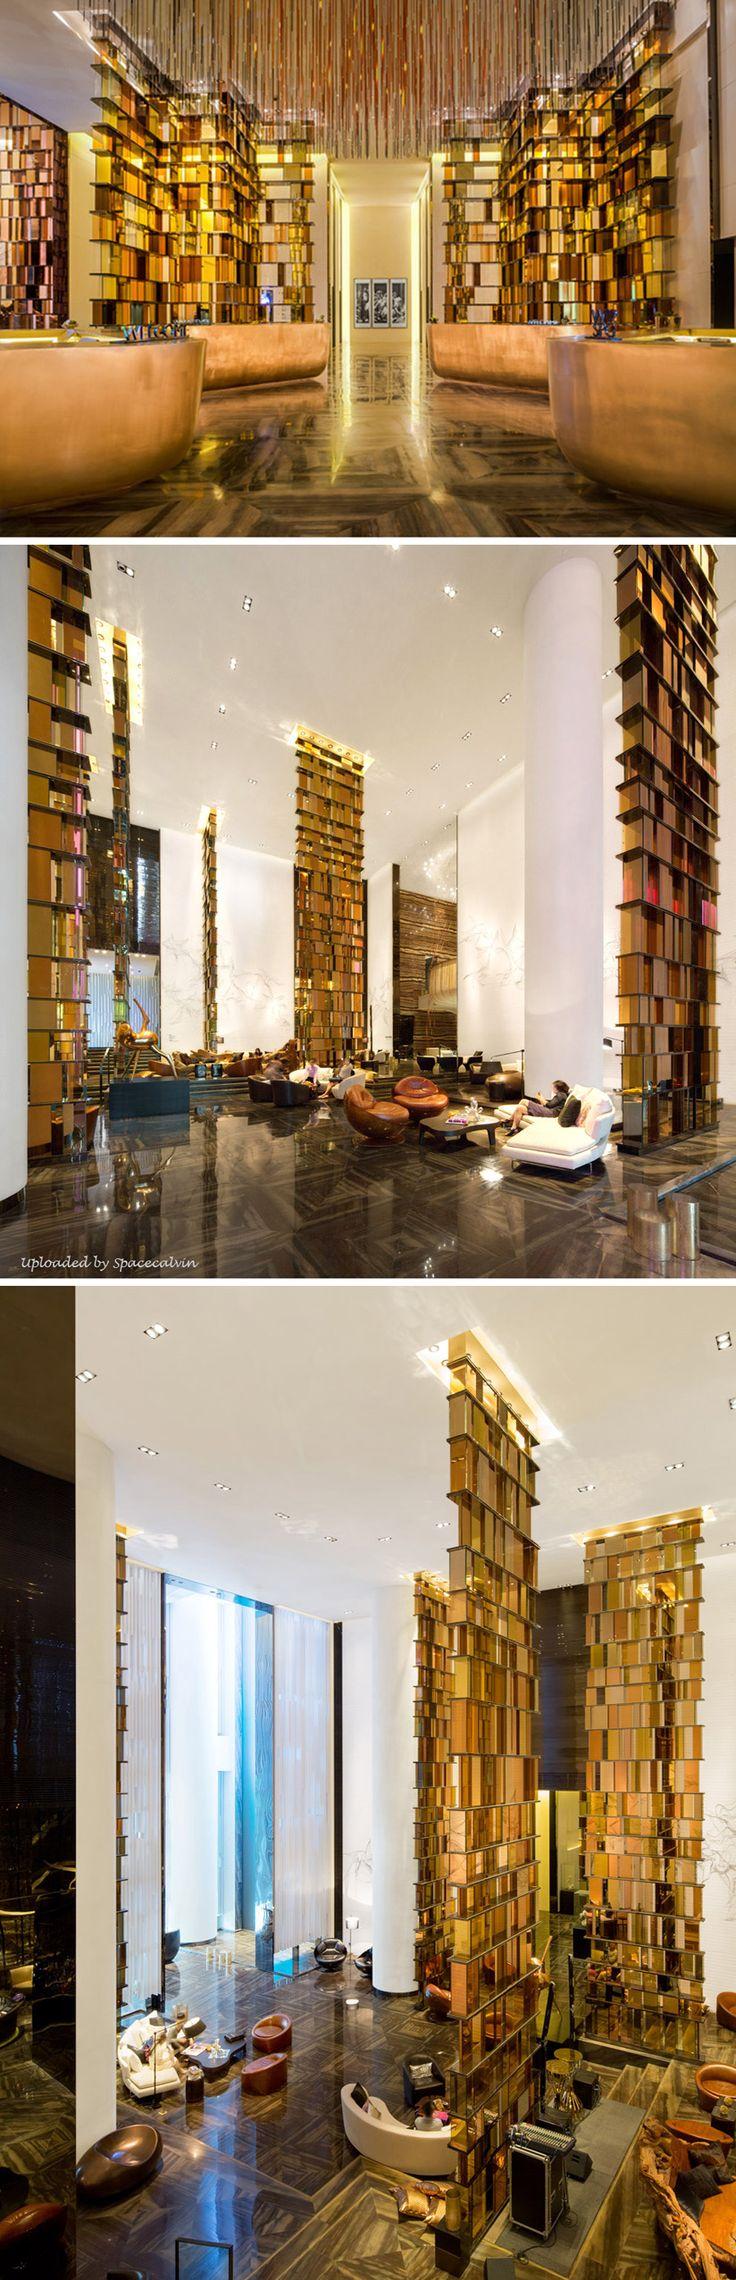 W Hotel Guangzhou's Interior Design | Designed by Yabu Pushelberg - Amazing Hotel Interior Design. See also: http://designlimitededition.com/